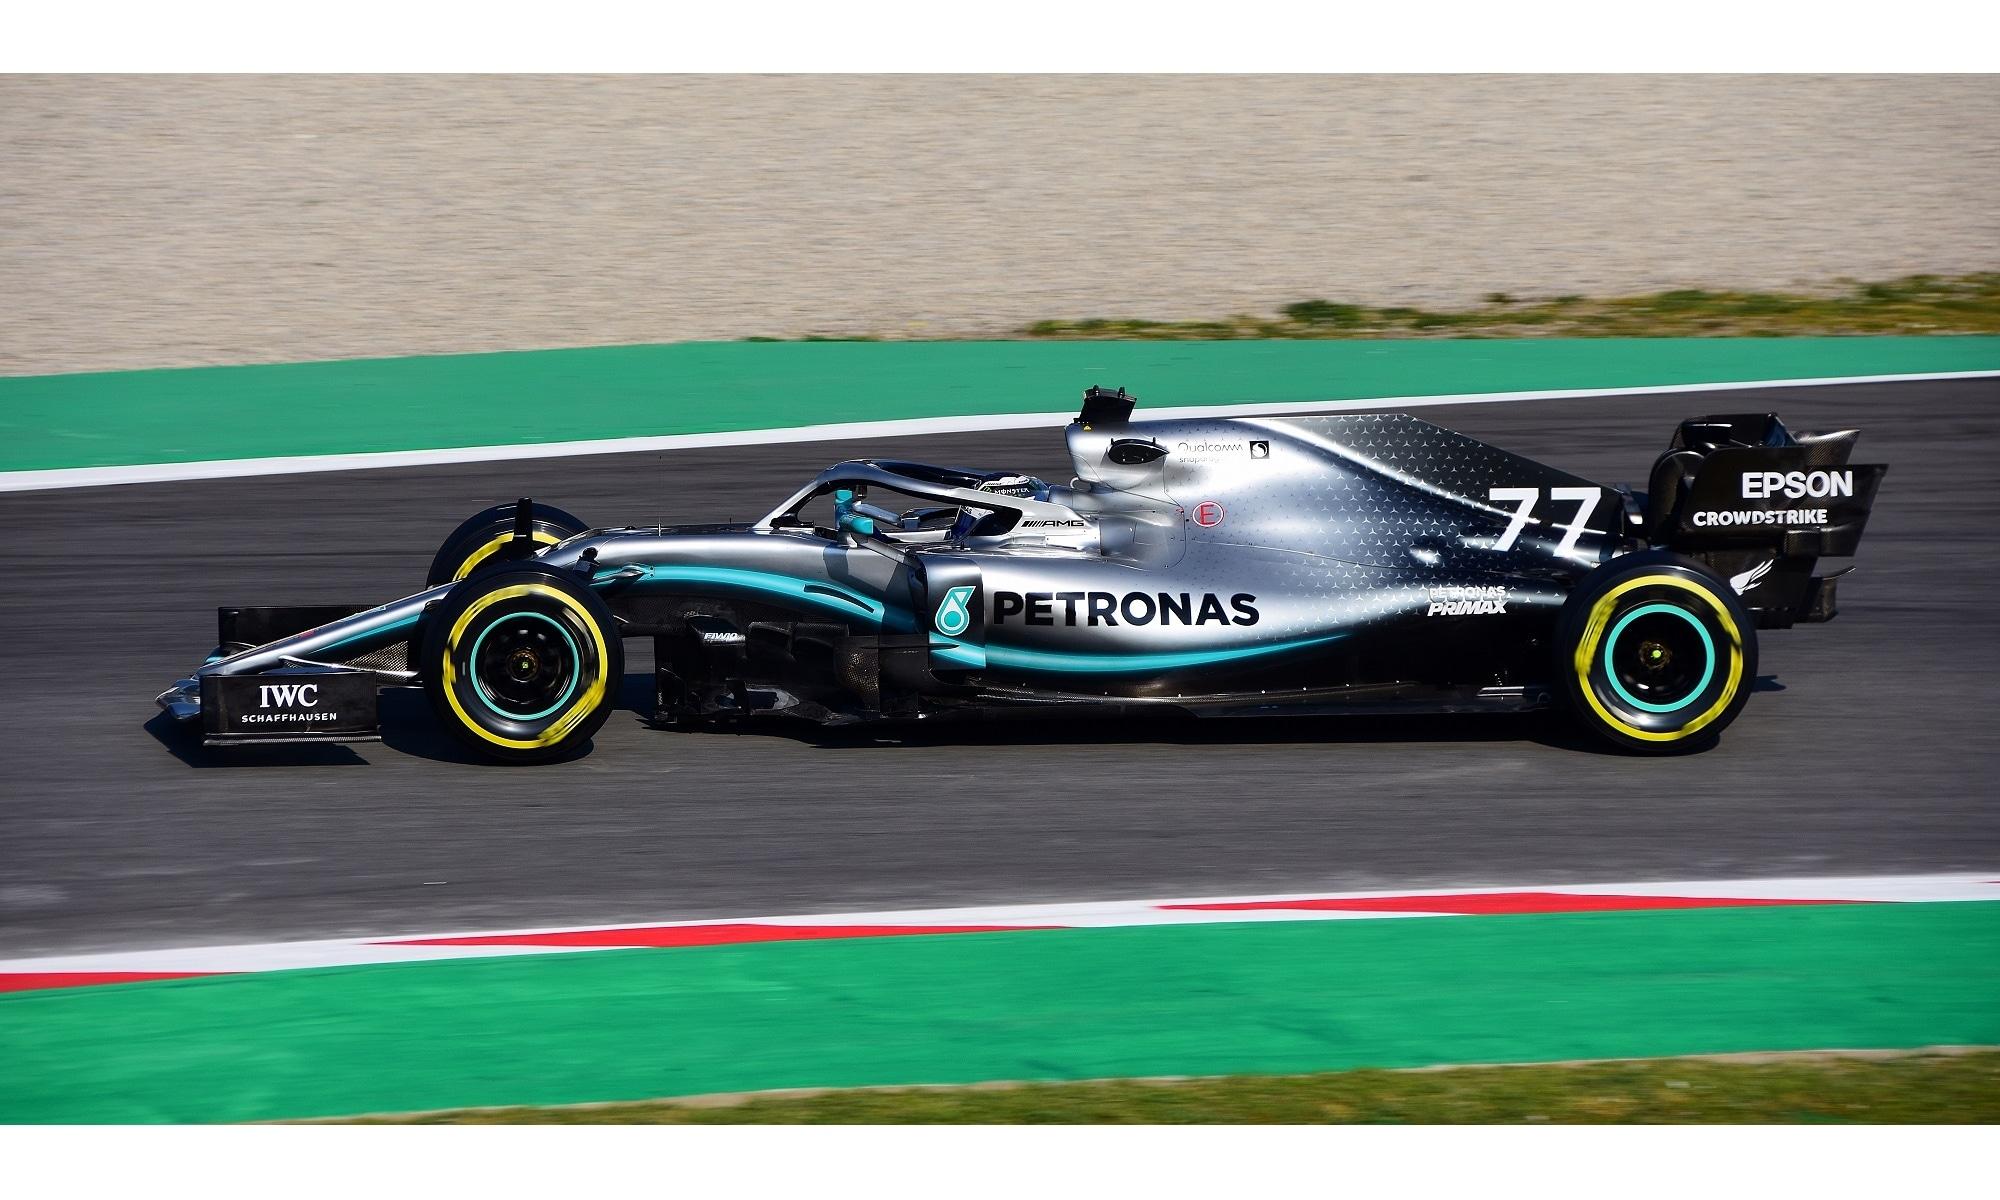 Mercedes F1, Valtteri Bottas